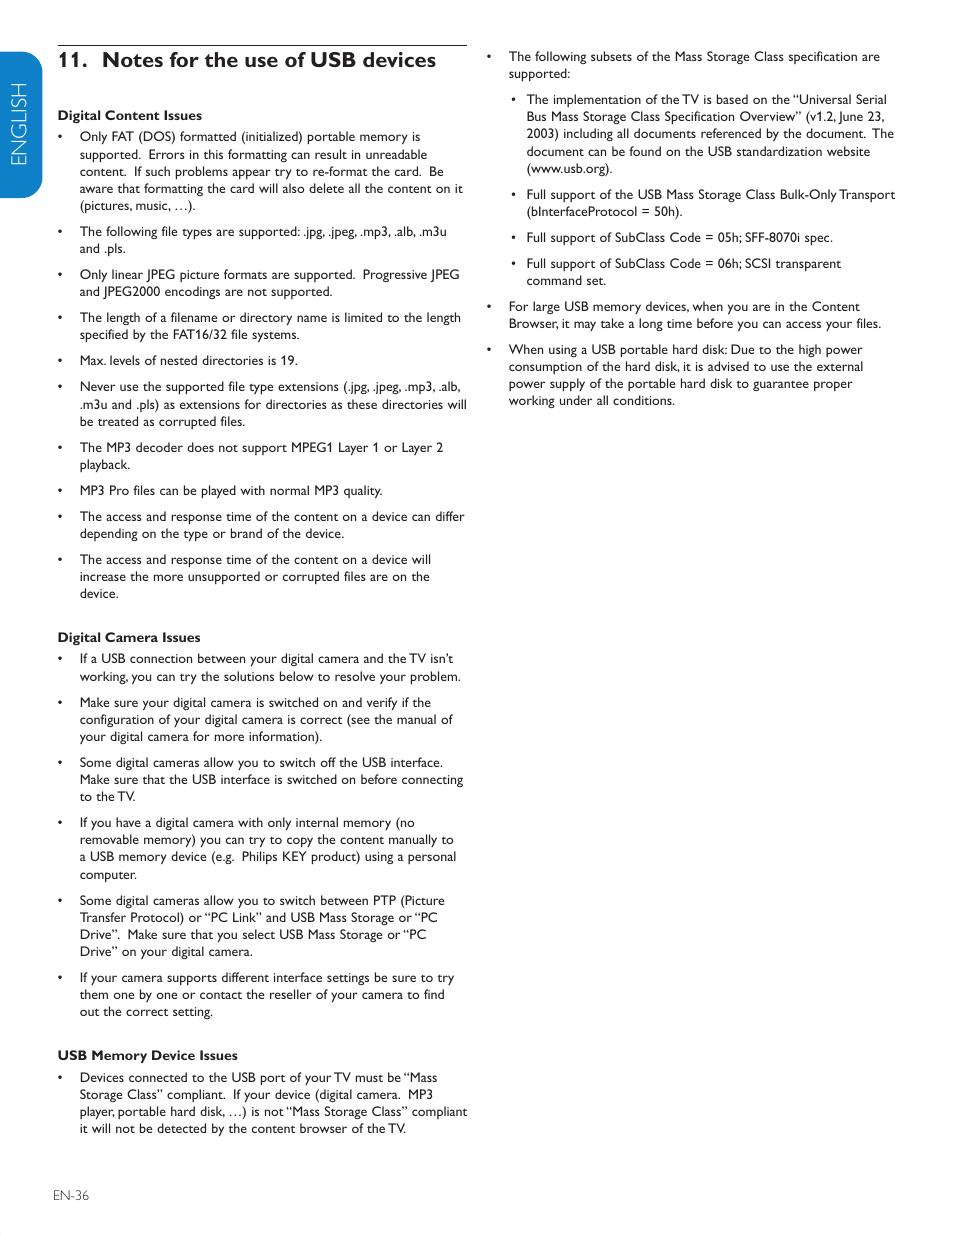 philips 42pfl5603d f7 user manual page 37 44 original mode rh manualsdir com